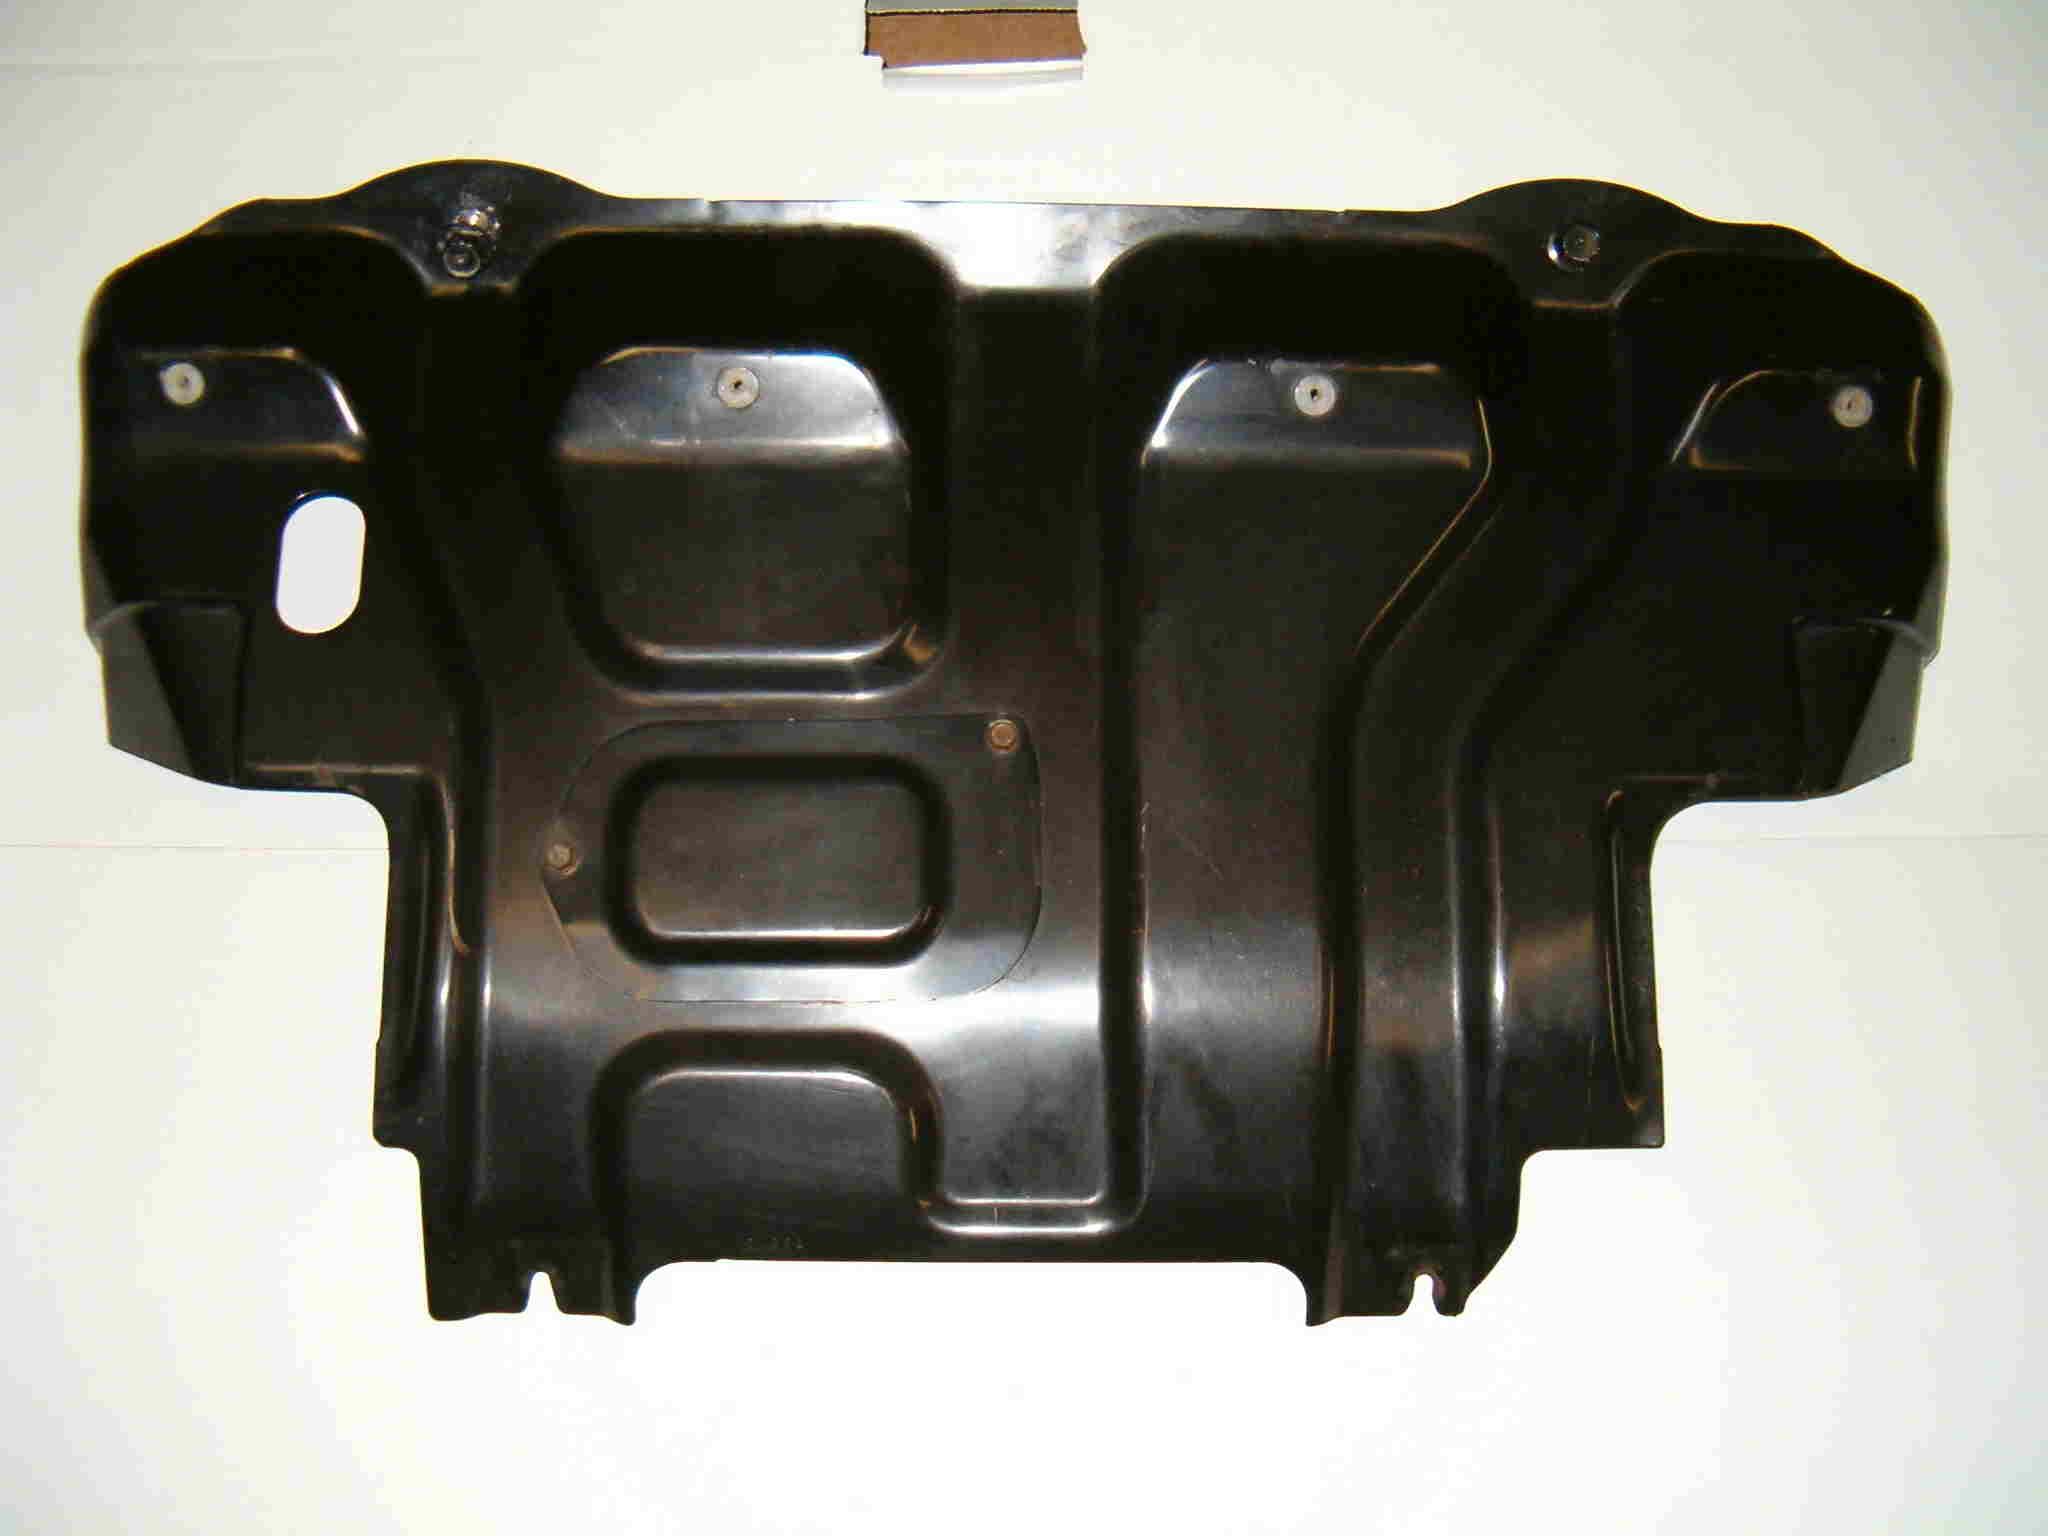 Genuine Nissan Parts for sale Cheap Skid Plate Bumper